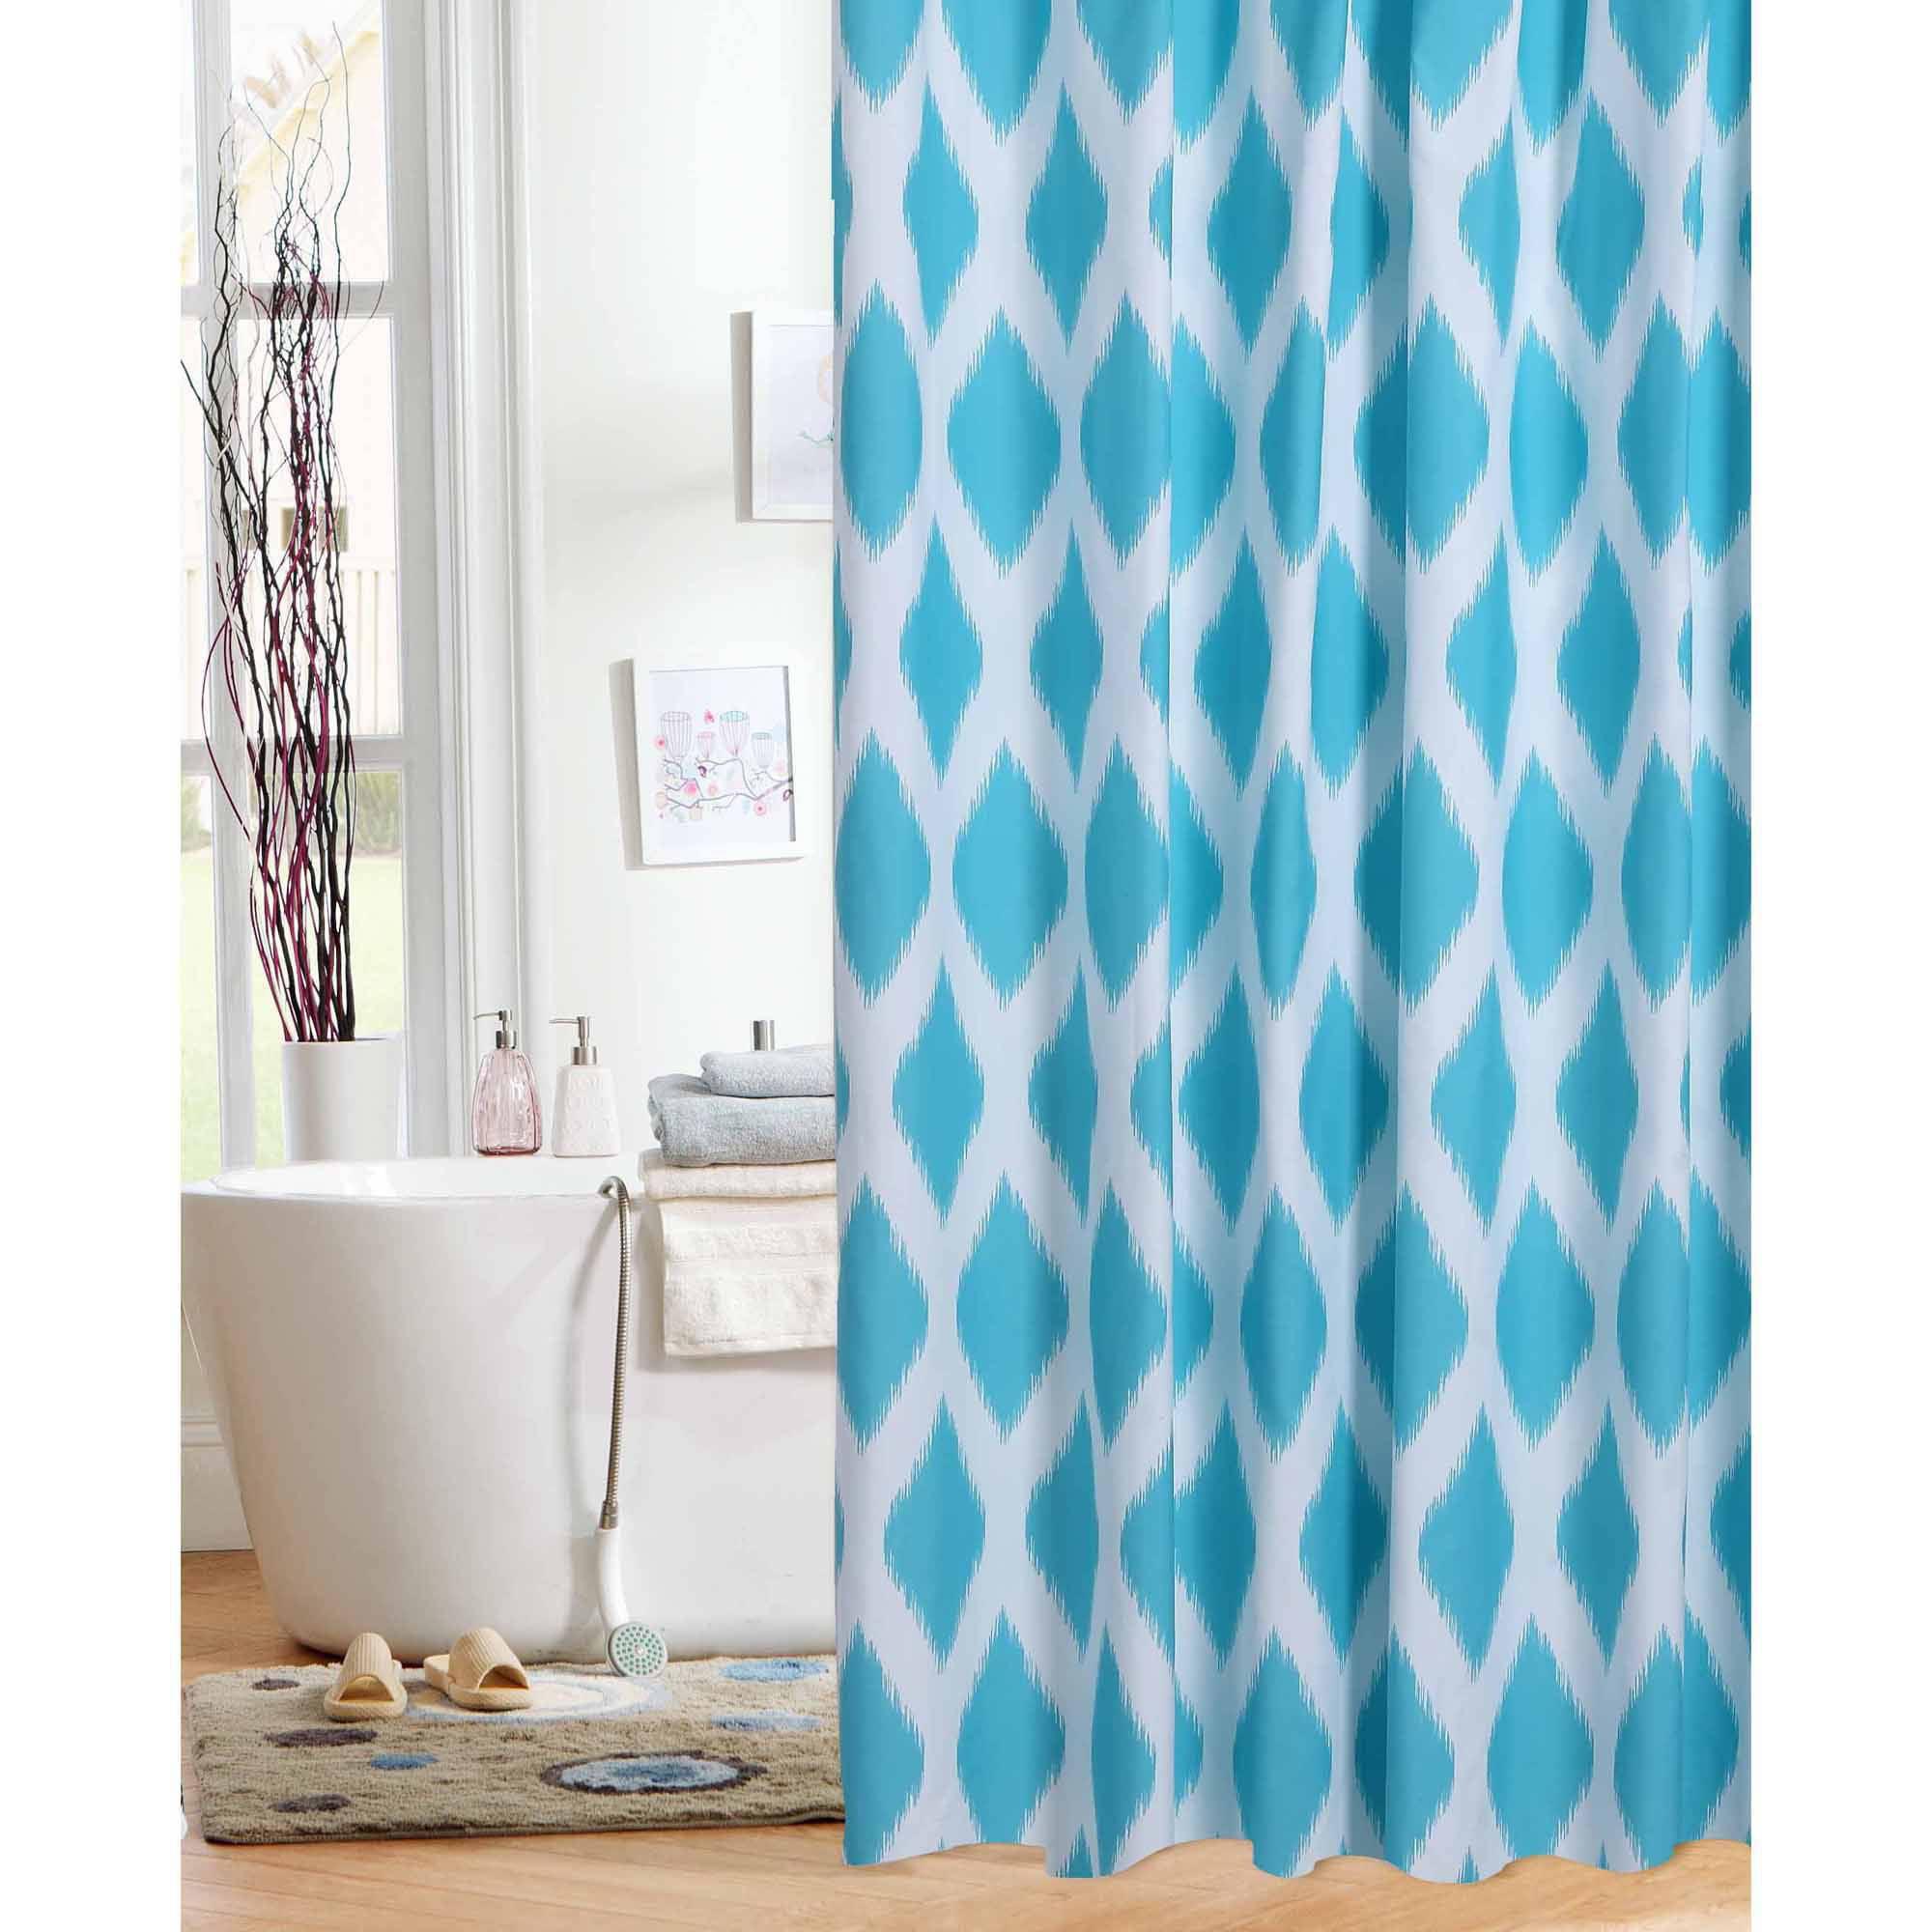 Mainstays Diamond Ikat Teal Shower Curtain - Walmart.com